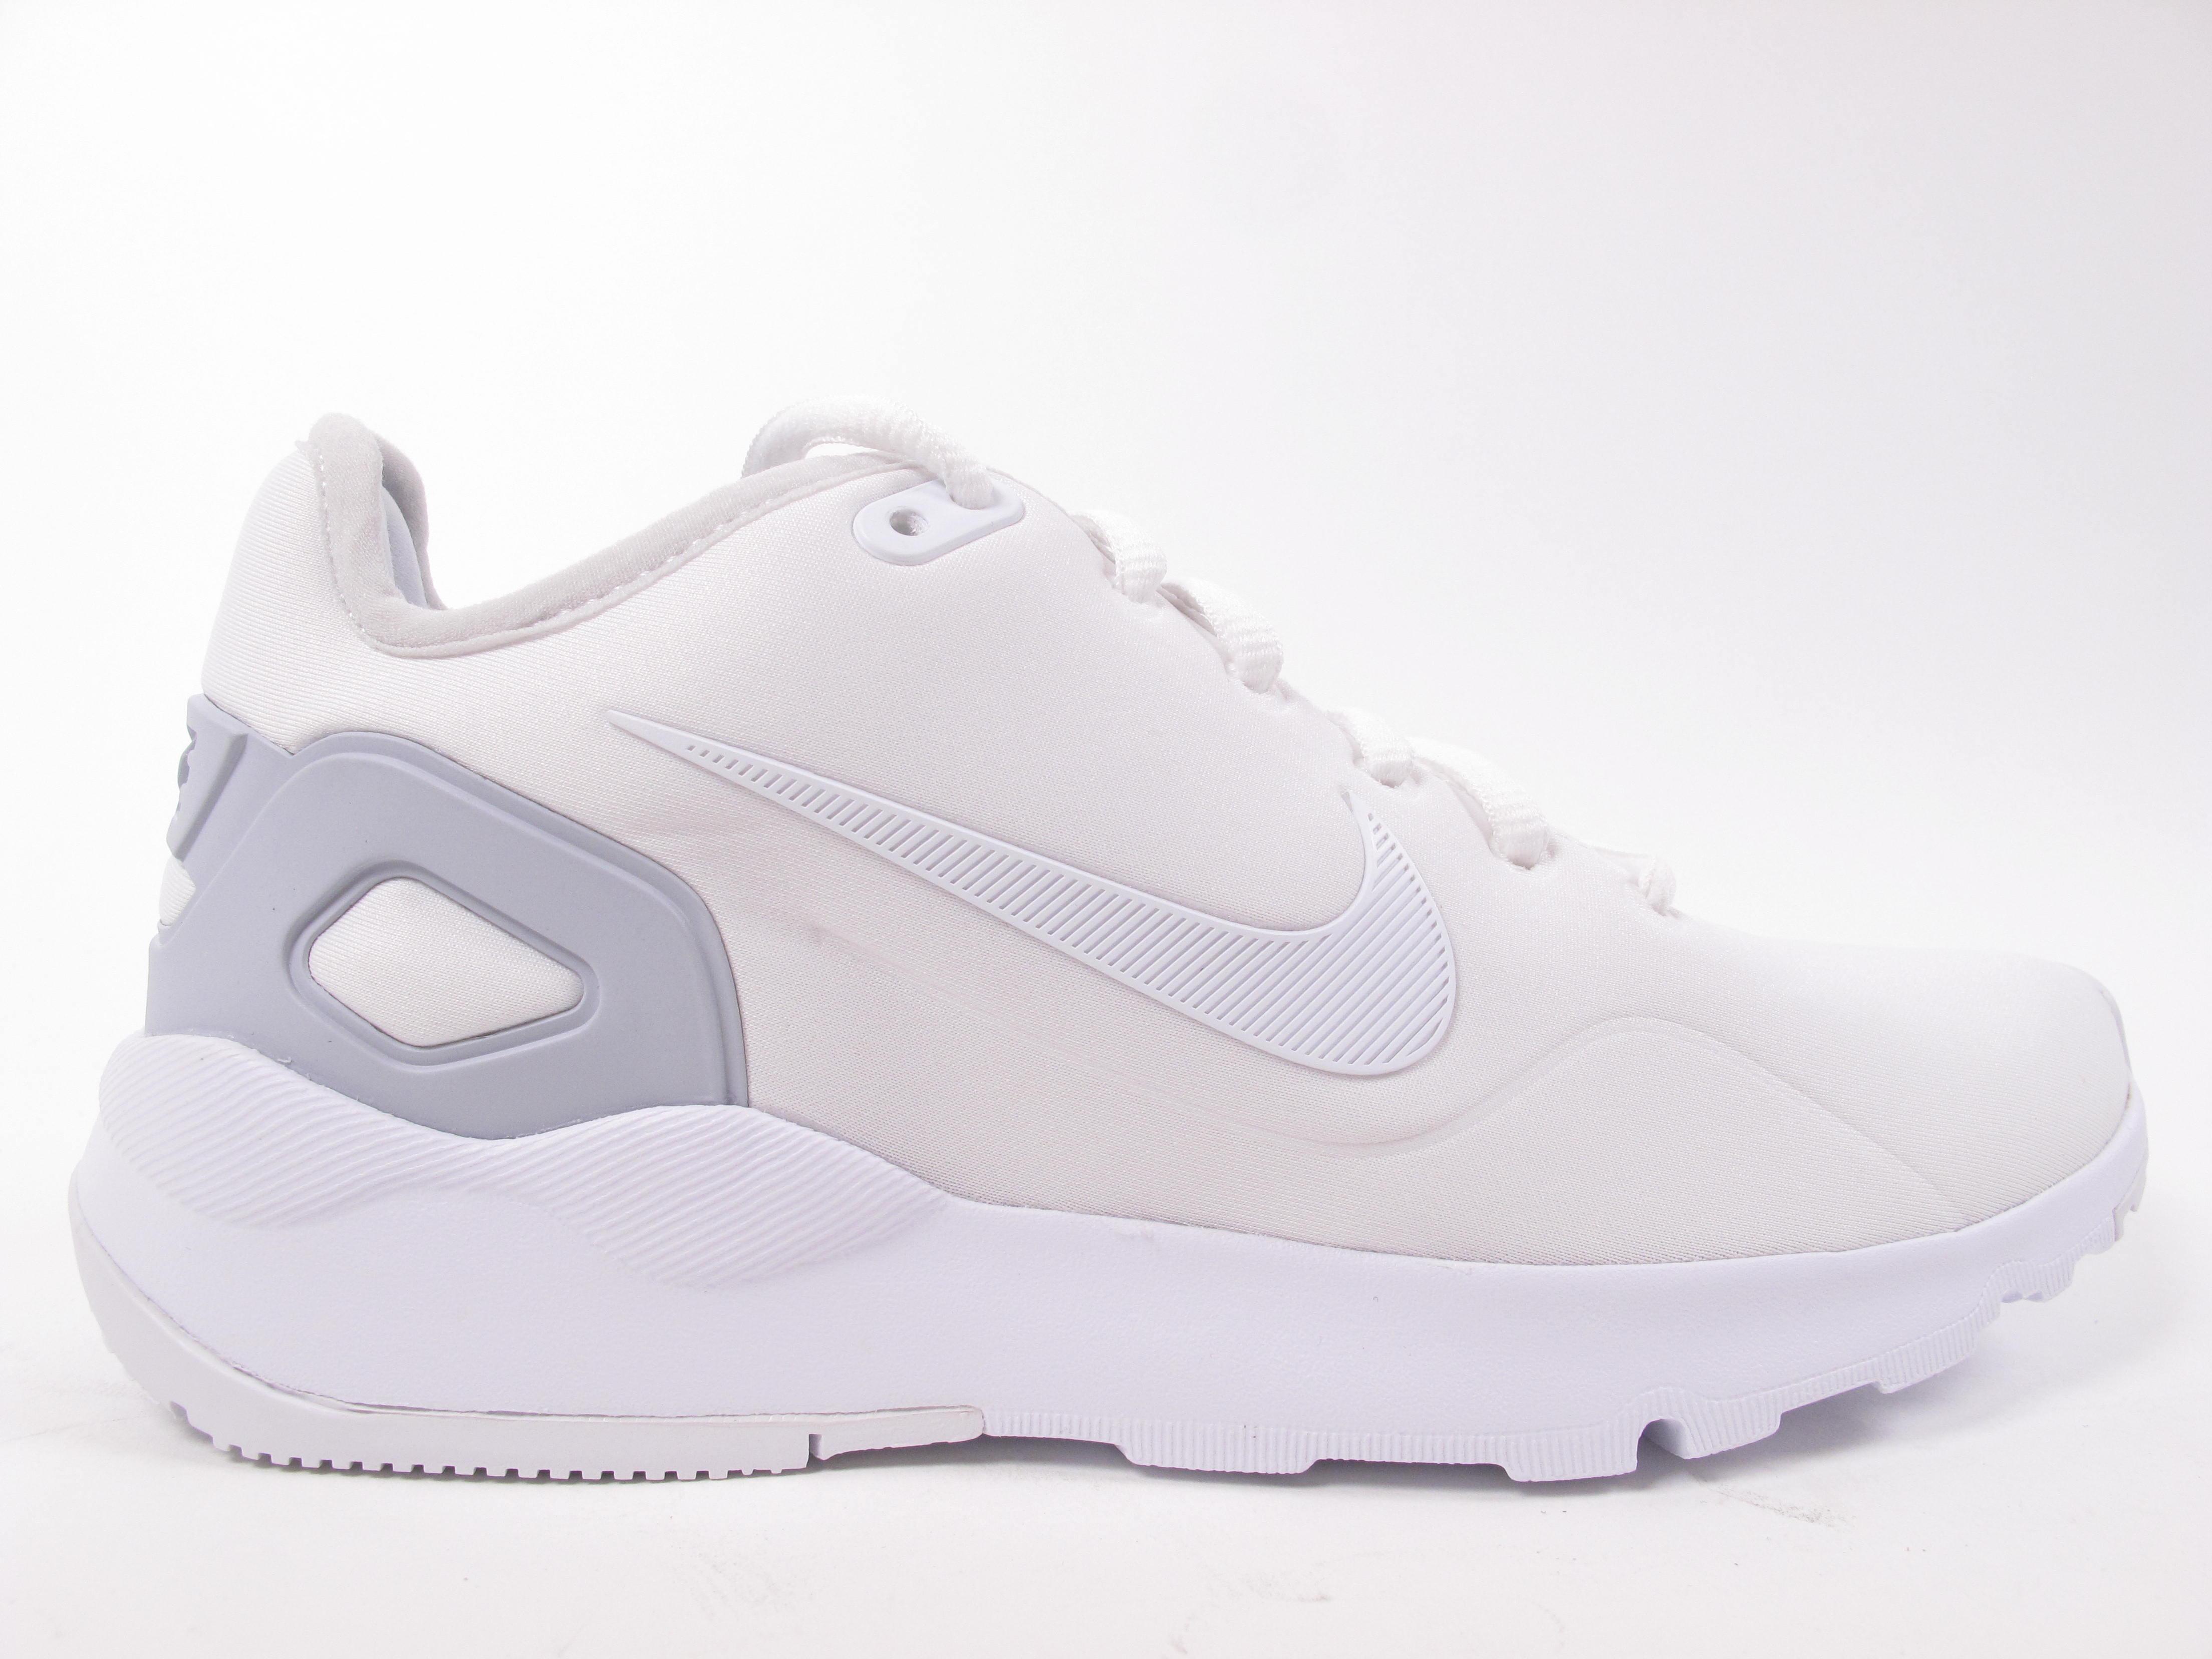 Nike Ls Coureur Baskets women shoes de Course 902864-100 white Neuf